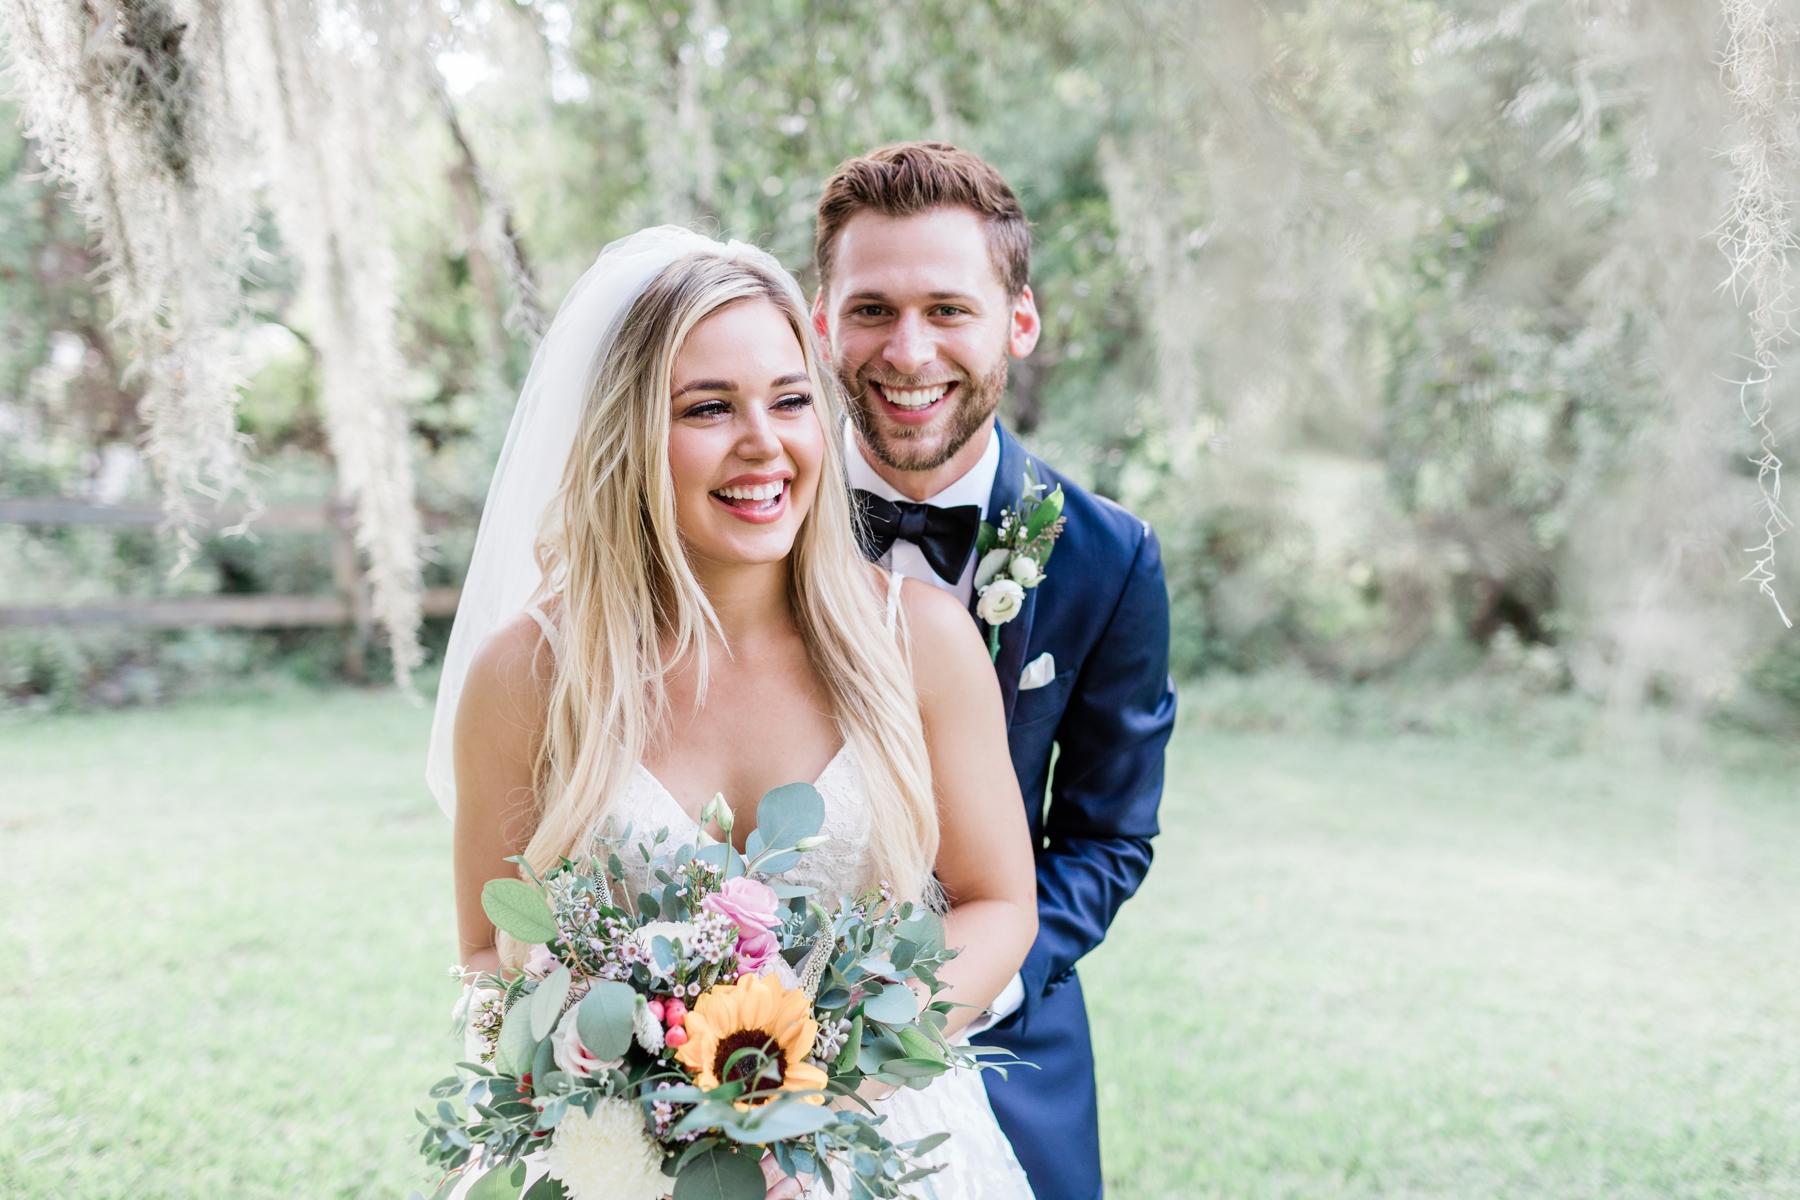 Apt-B-Photography-Maddy-Jon-savannah-wedding-photographer-4.jpg